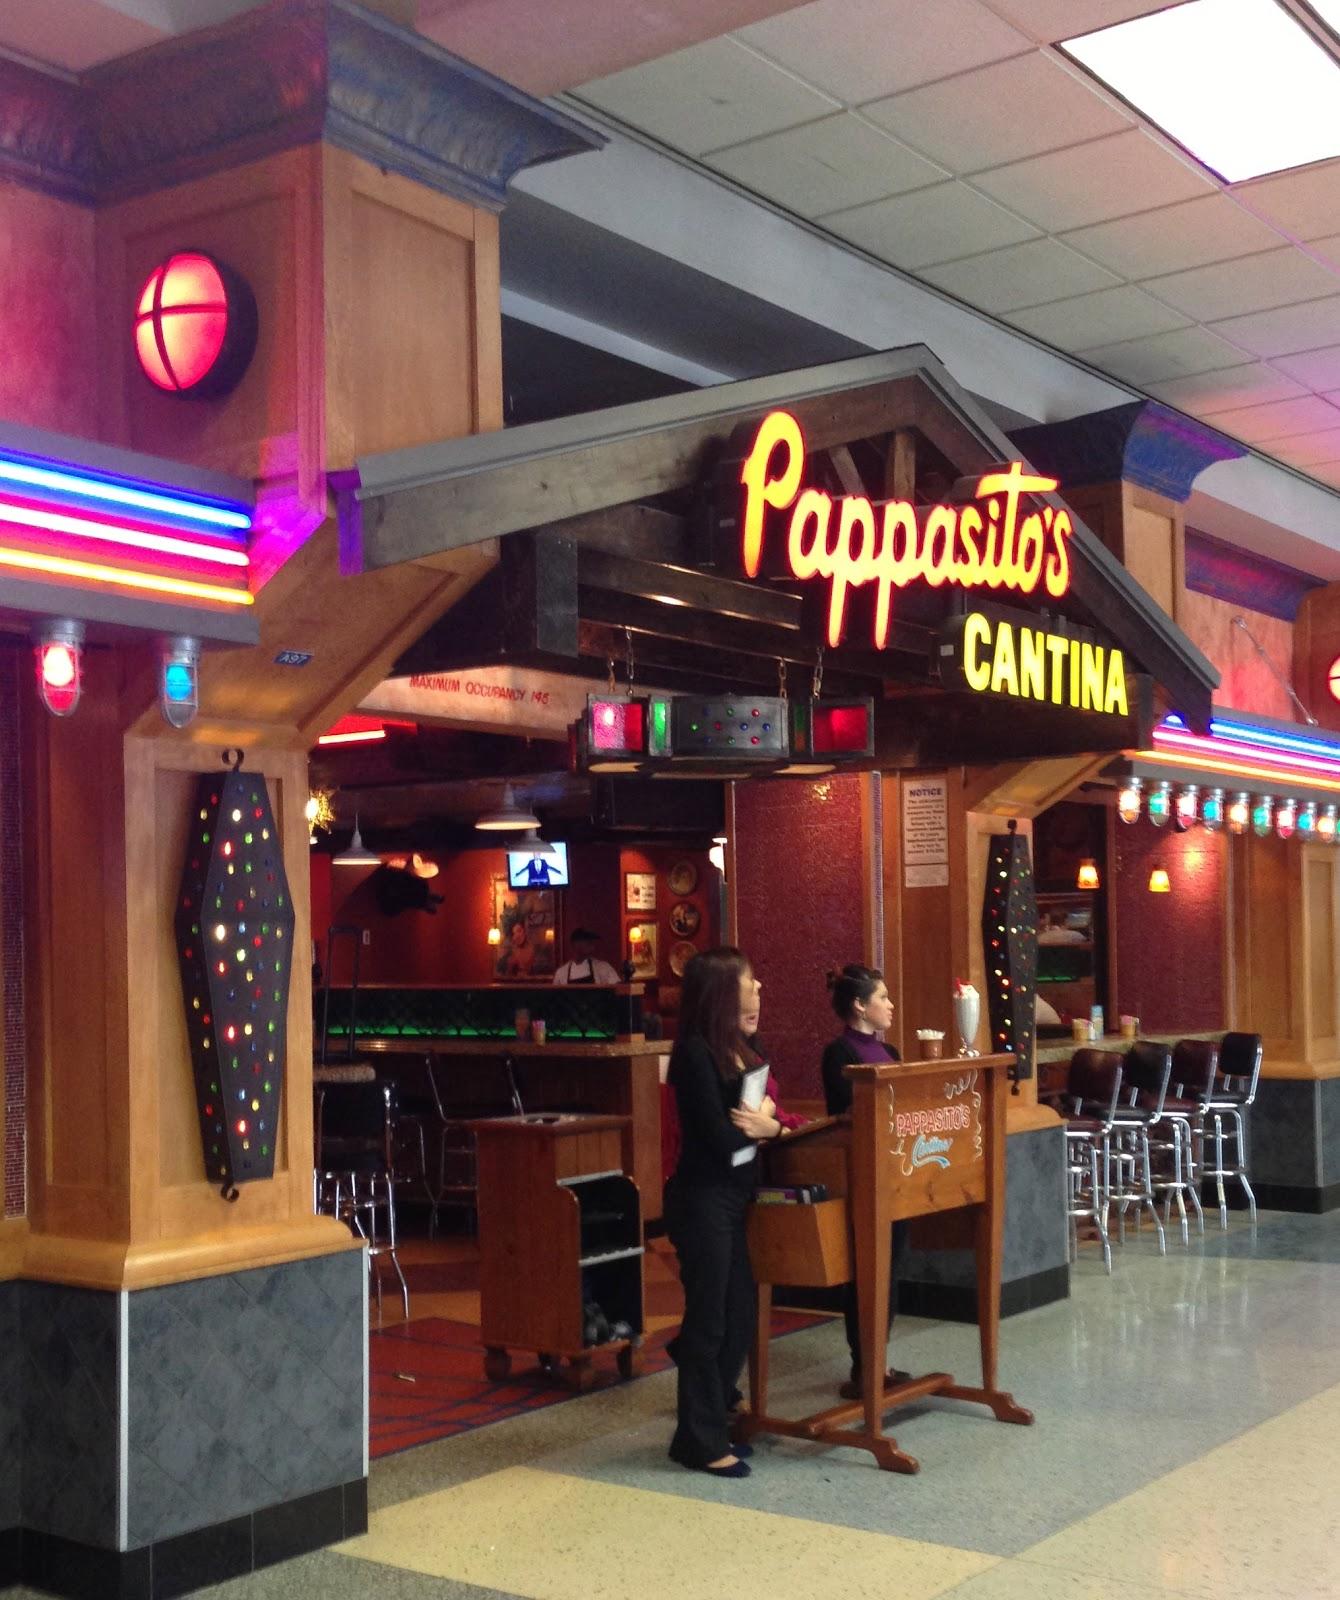 TASTE OF HAWAII: PAPPASITO\'S CANTINA - DALLAS, TEXAS